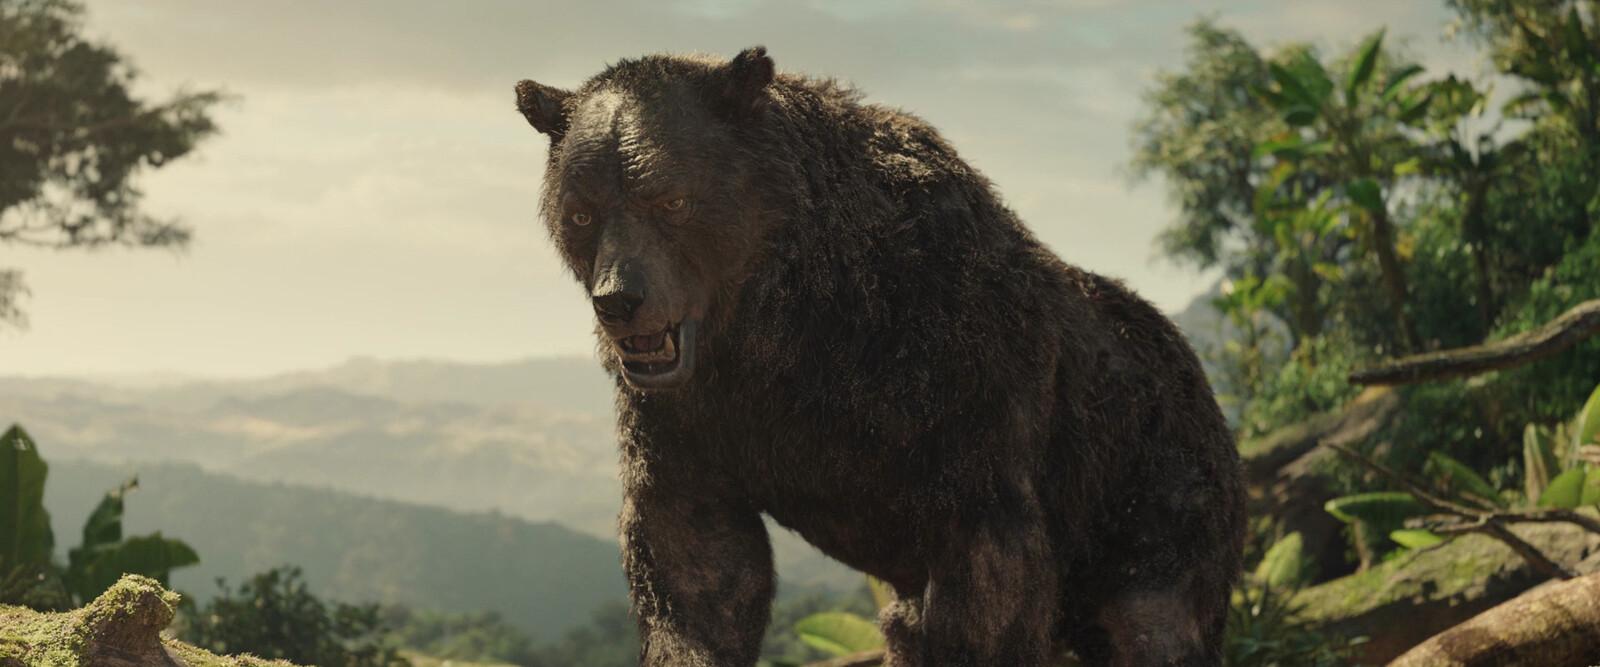 Baloo, full body